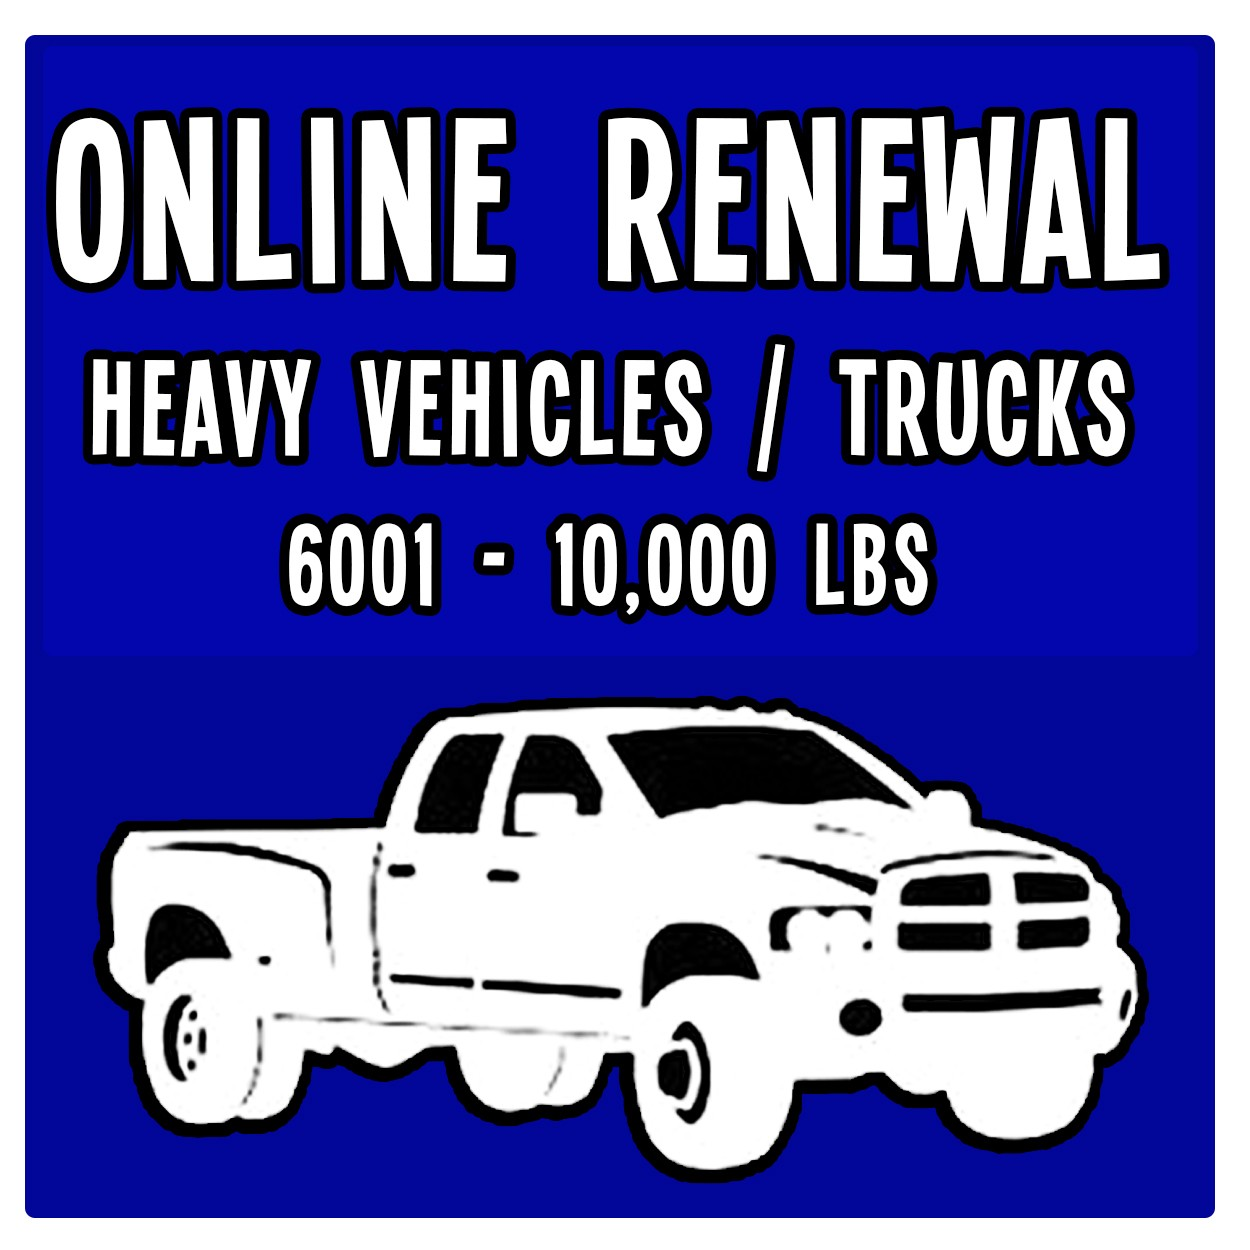 Register car online texas - Online Registration Renewal For Heavy